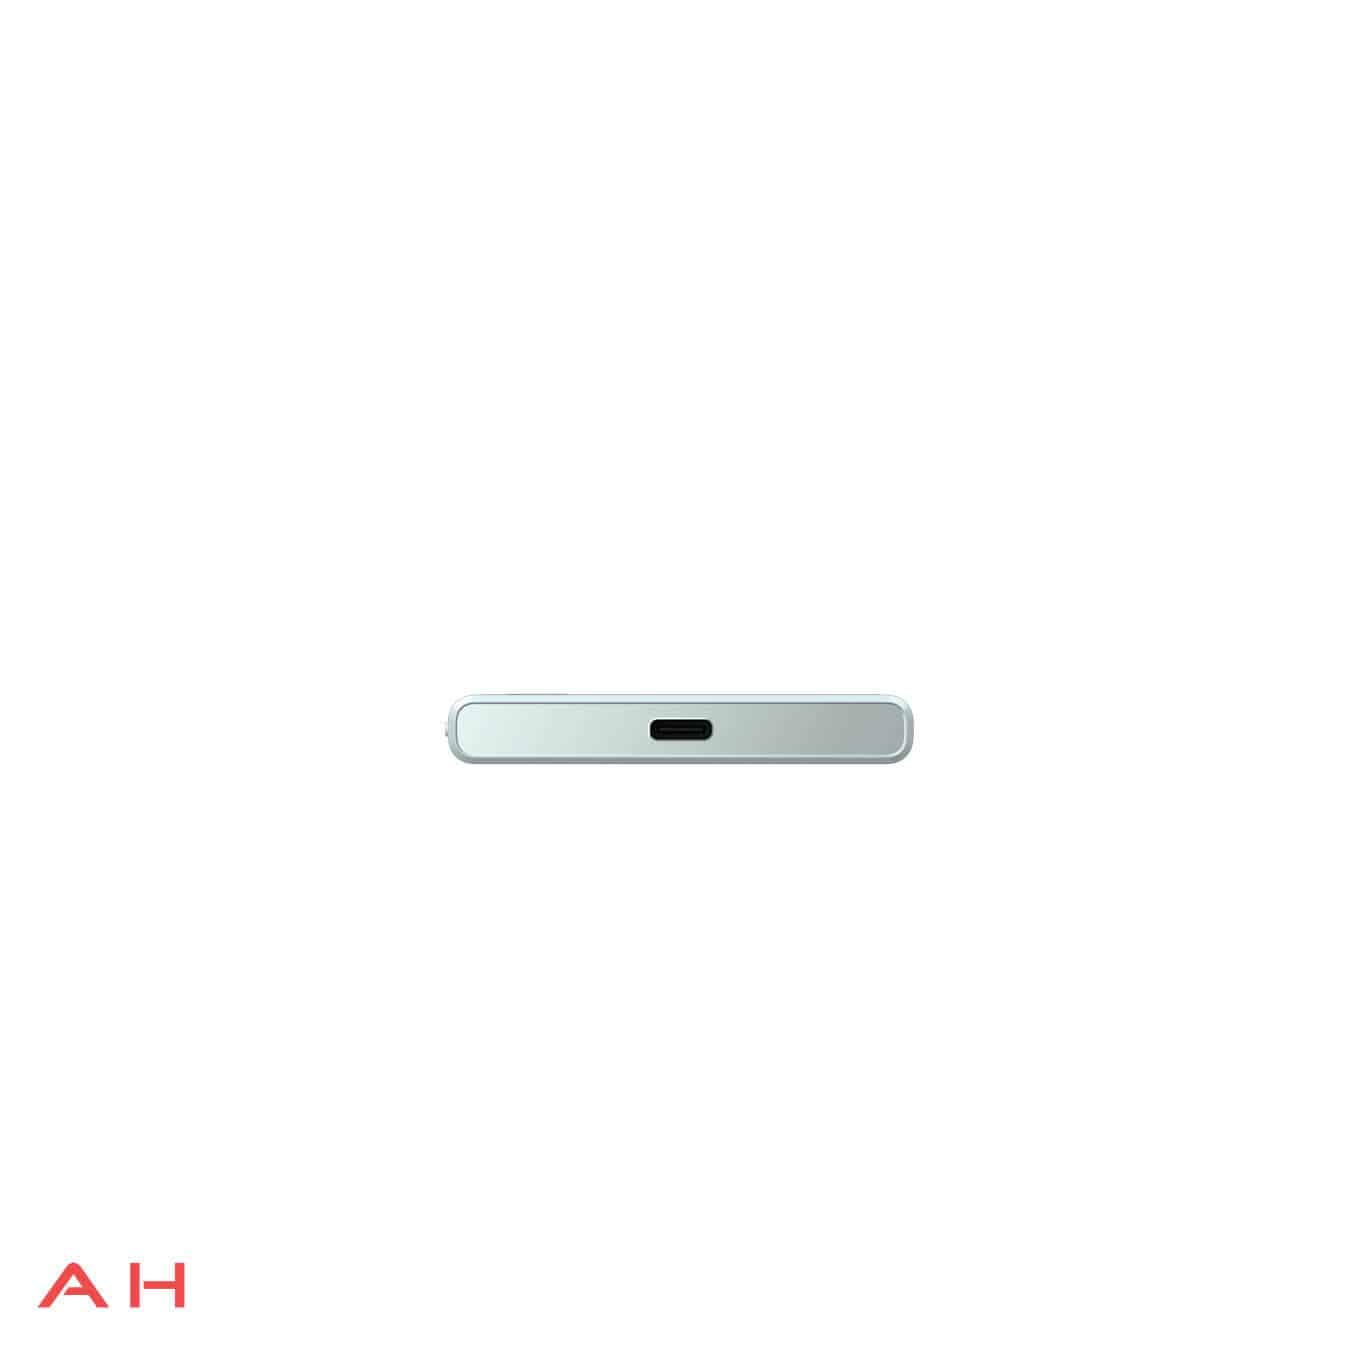 Sony Xperia X Compact AH 1